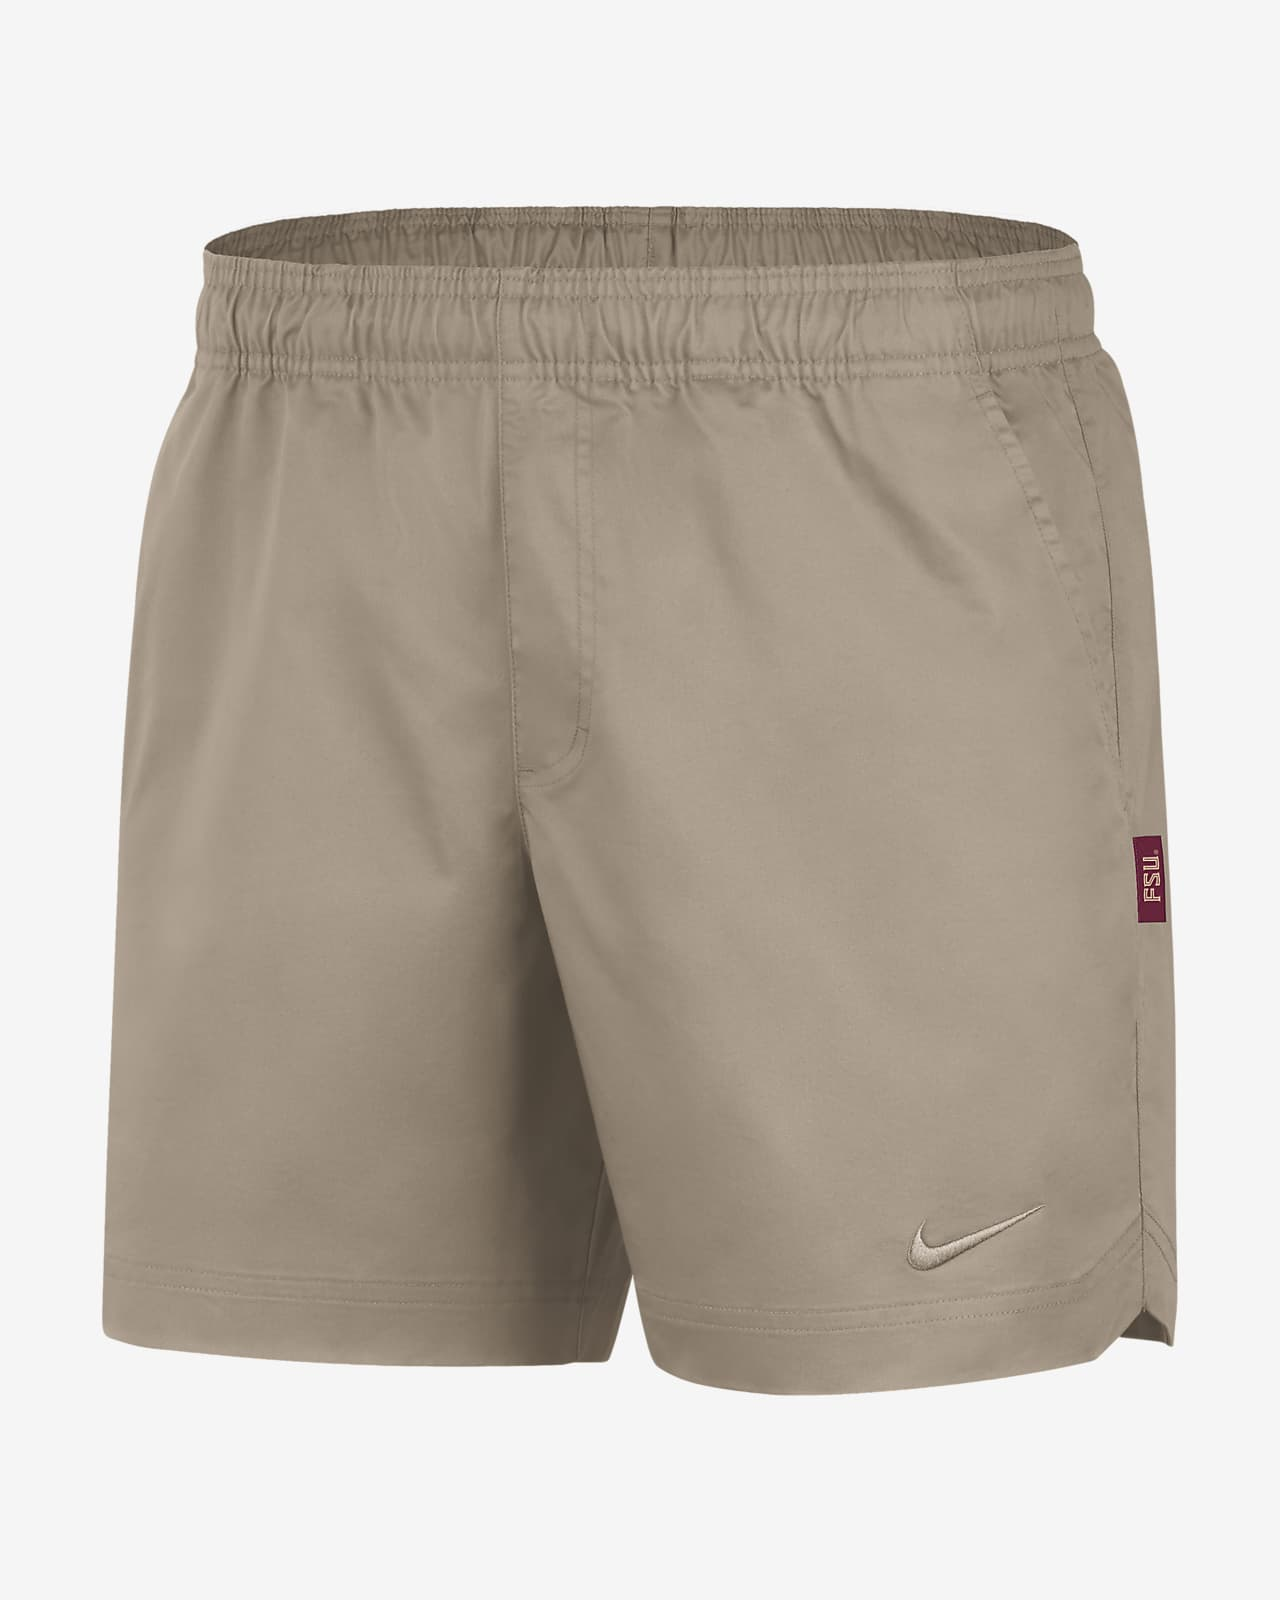 Nike College (Florida State) Men's Shorts